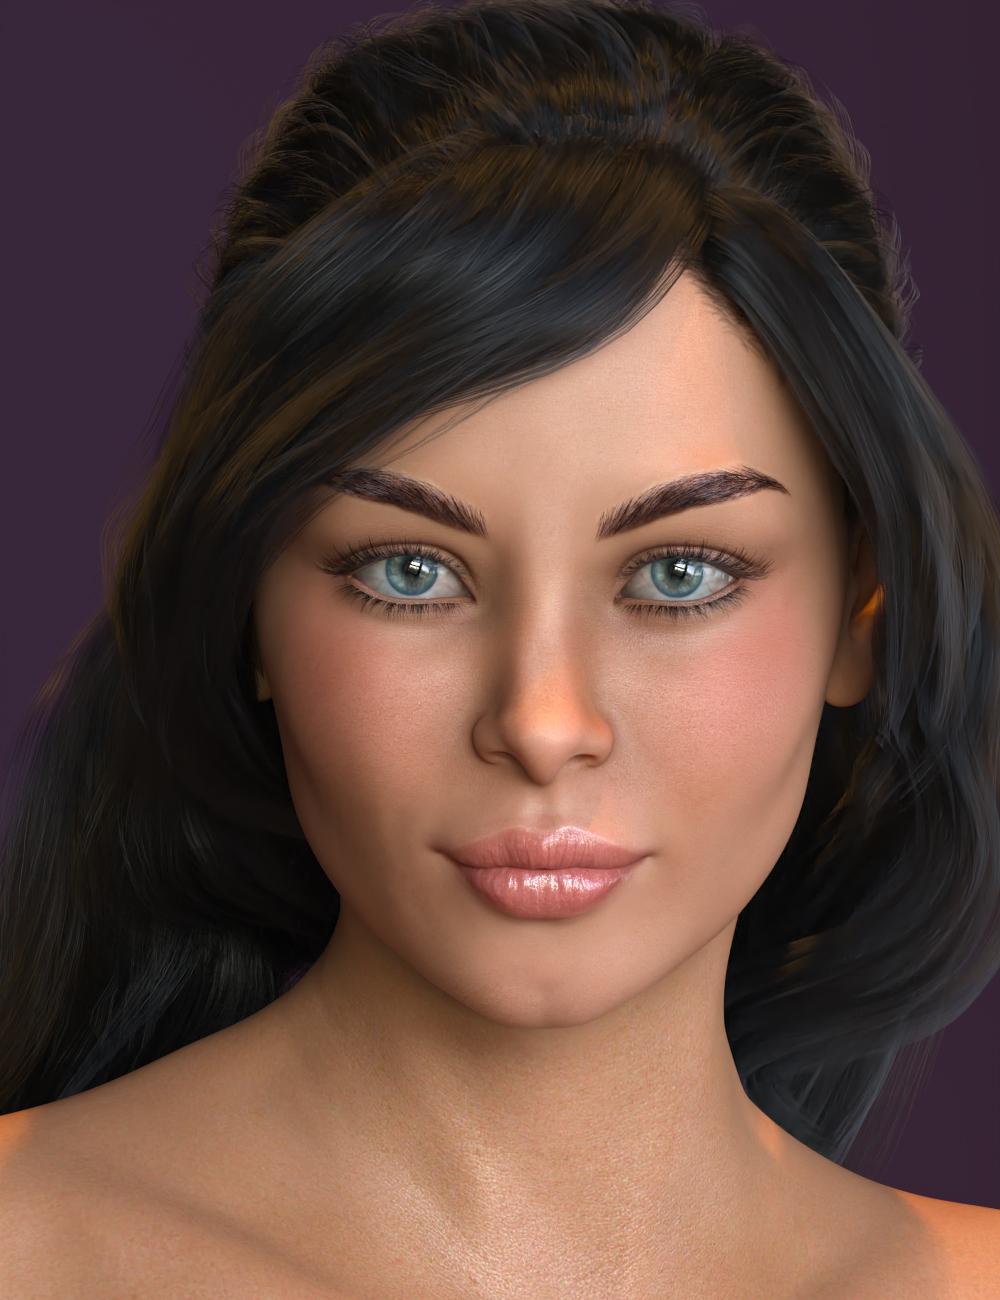 Skylar HD for Gabriela 8 by: 3DSublimeProductionsVex, 3D Models by Daz 3D